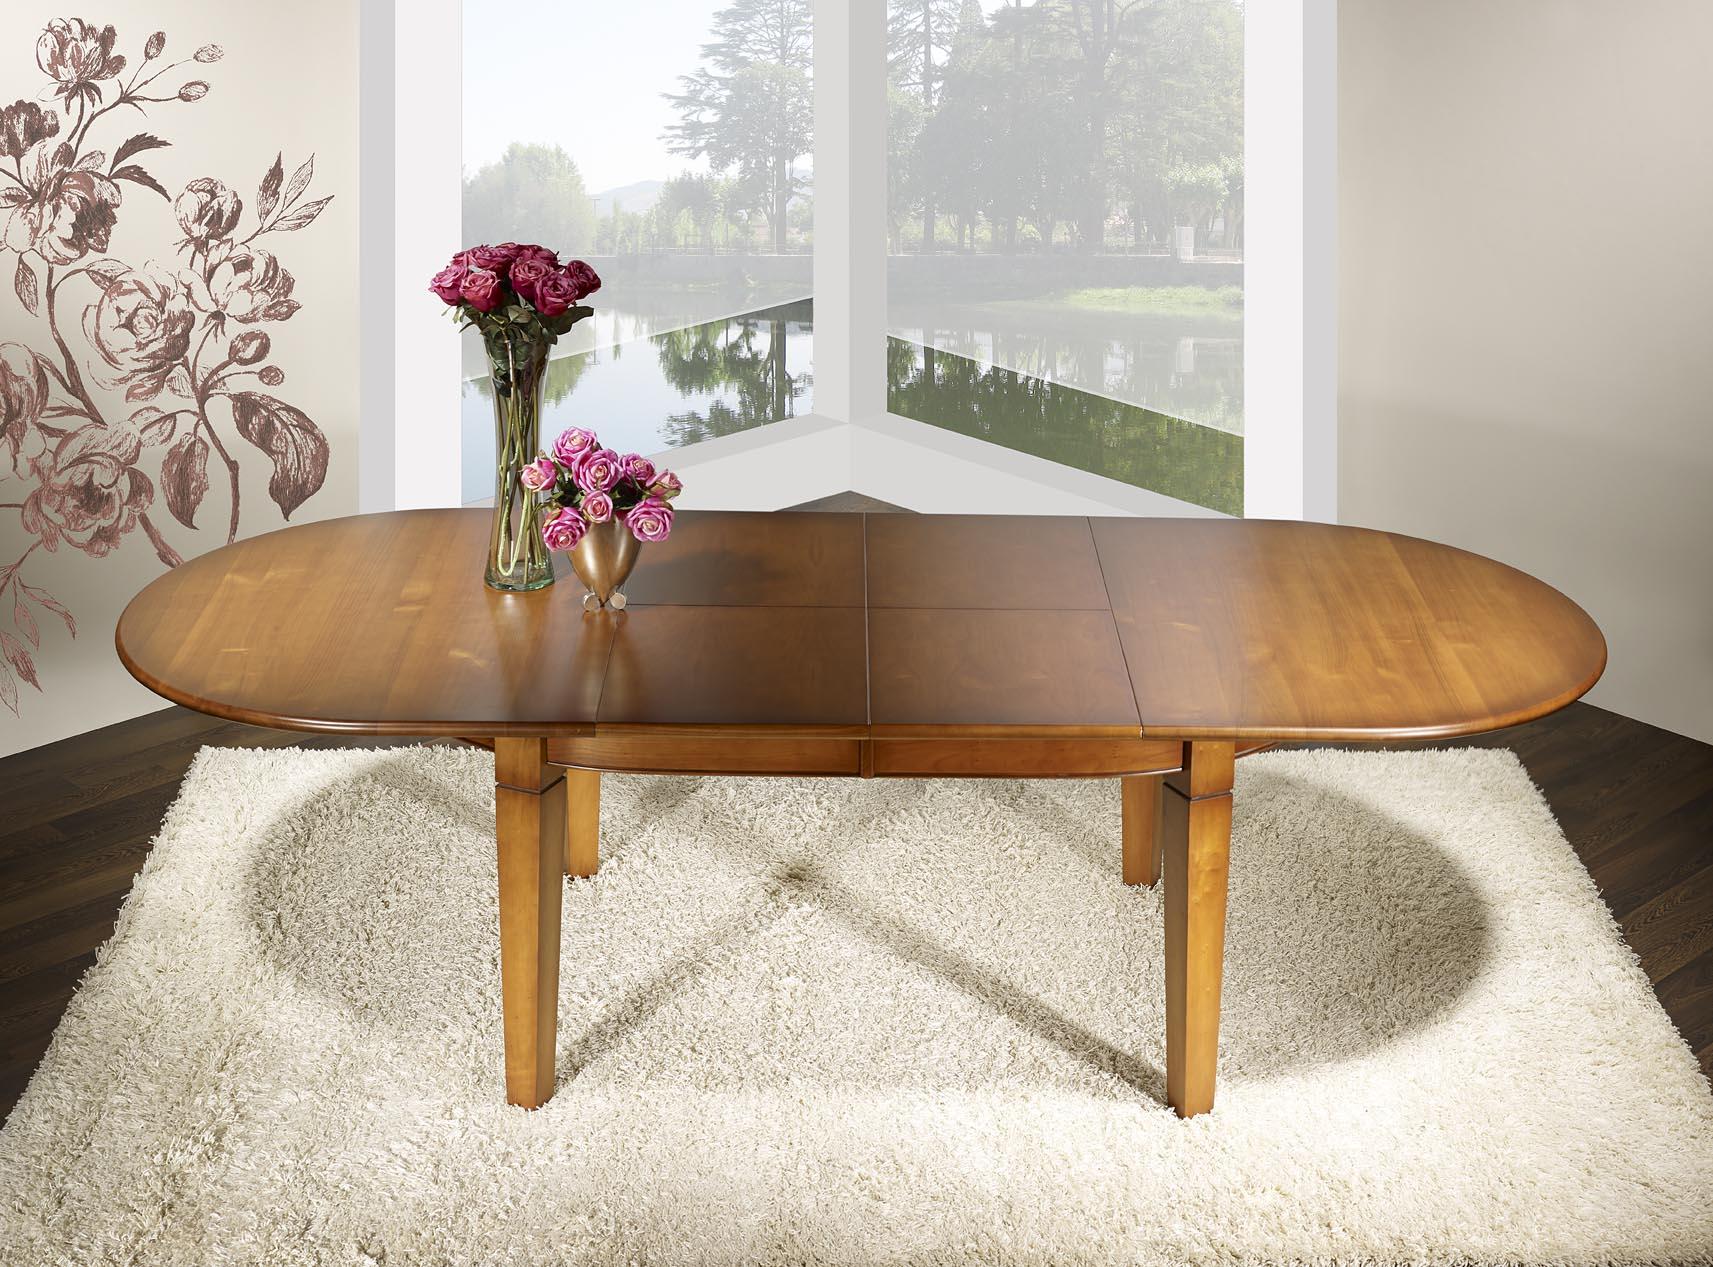 table ovale 180x110 en merisier de style campagne 4 pieds. Black Bedroom Furniture Sets. Home Design Ideas